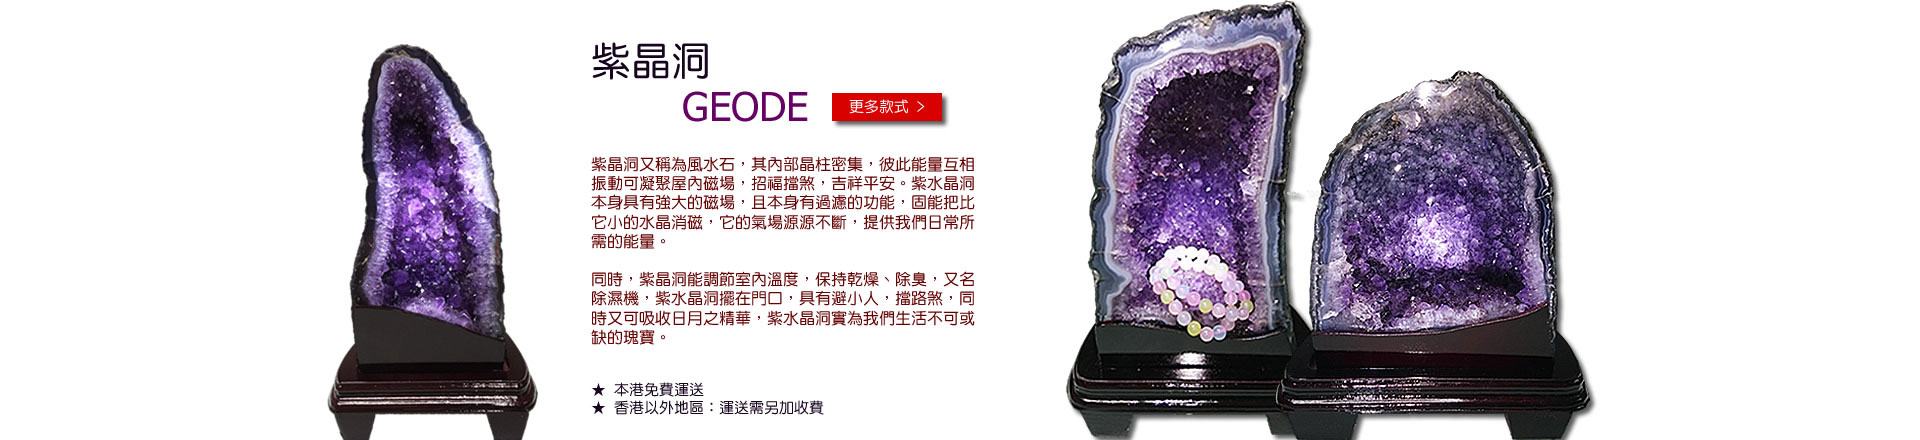 2 紫晶洞 Geode